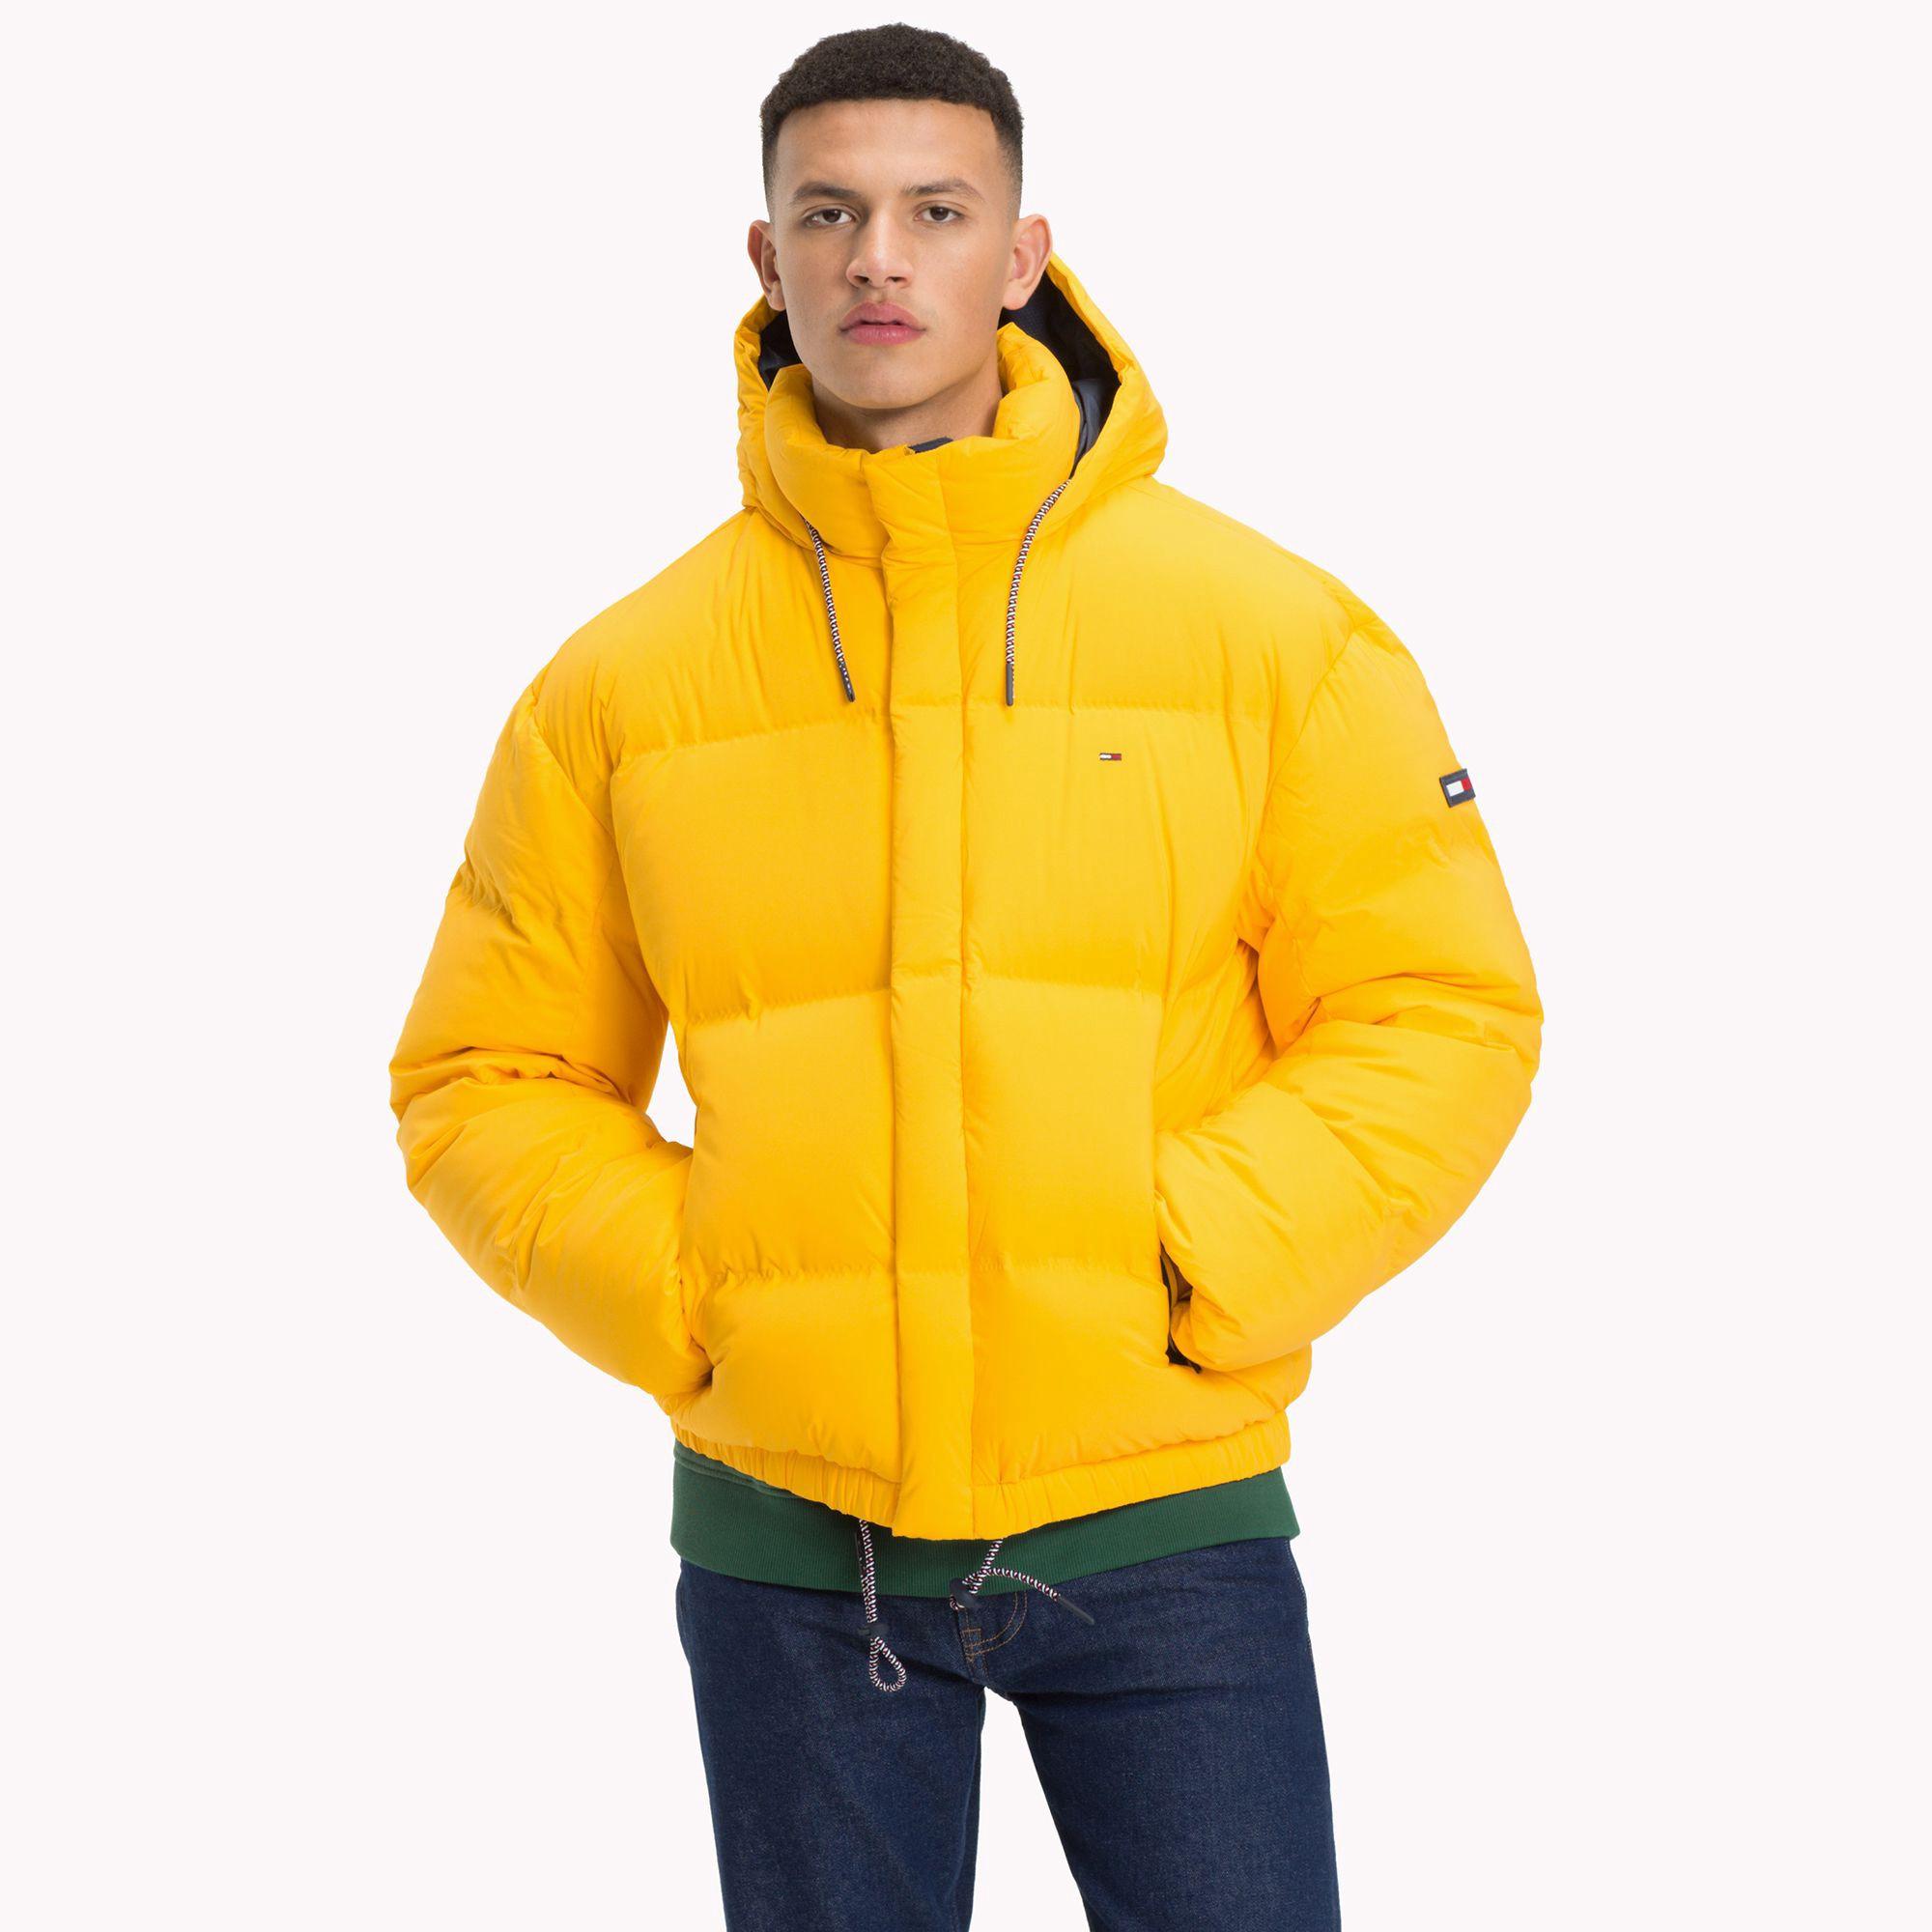 Tommy Hilfiger Oversized Down Jacket Spectra Yellow Xxl Jackets Tommy Hilfiger Man Jacket Down Jacket [ 2000 x 2000 Pixel ]